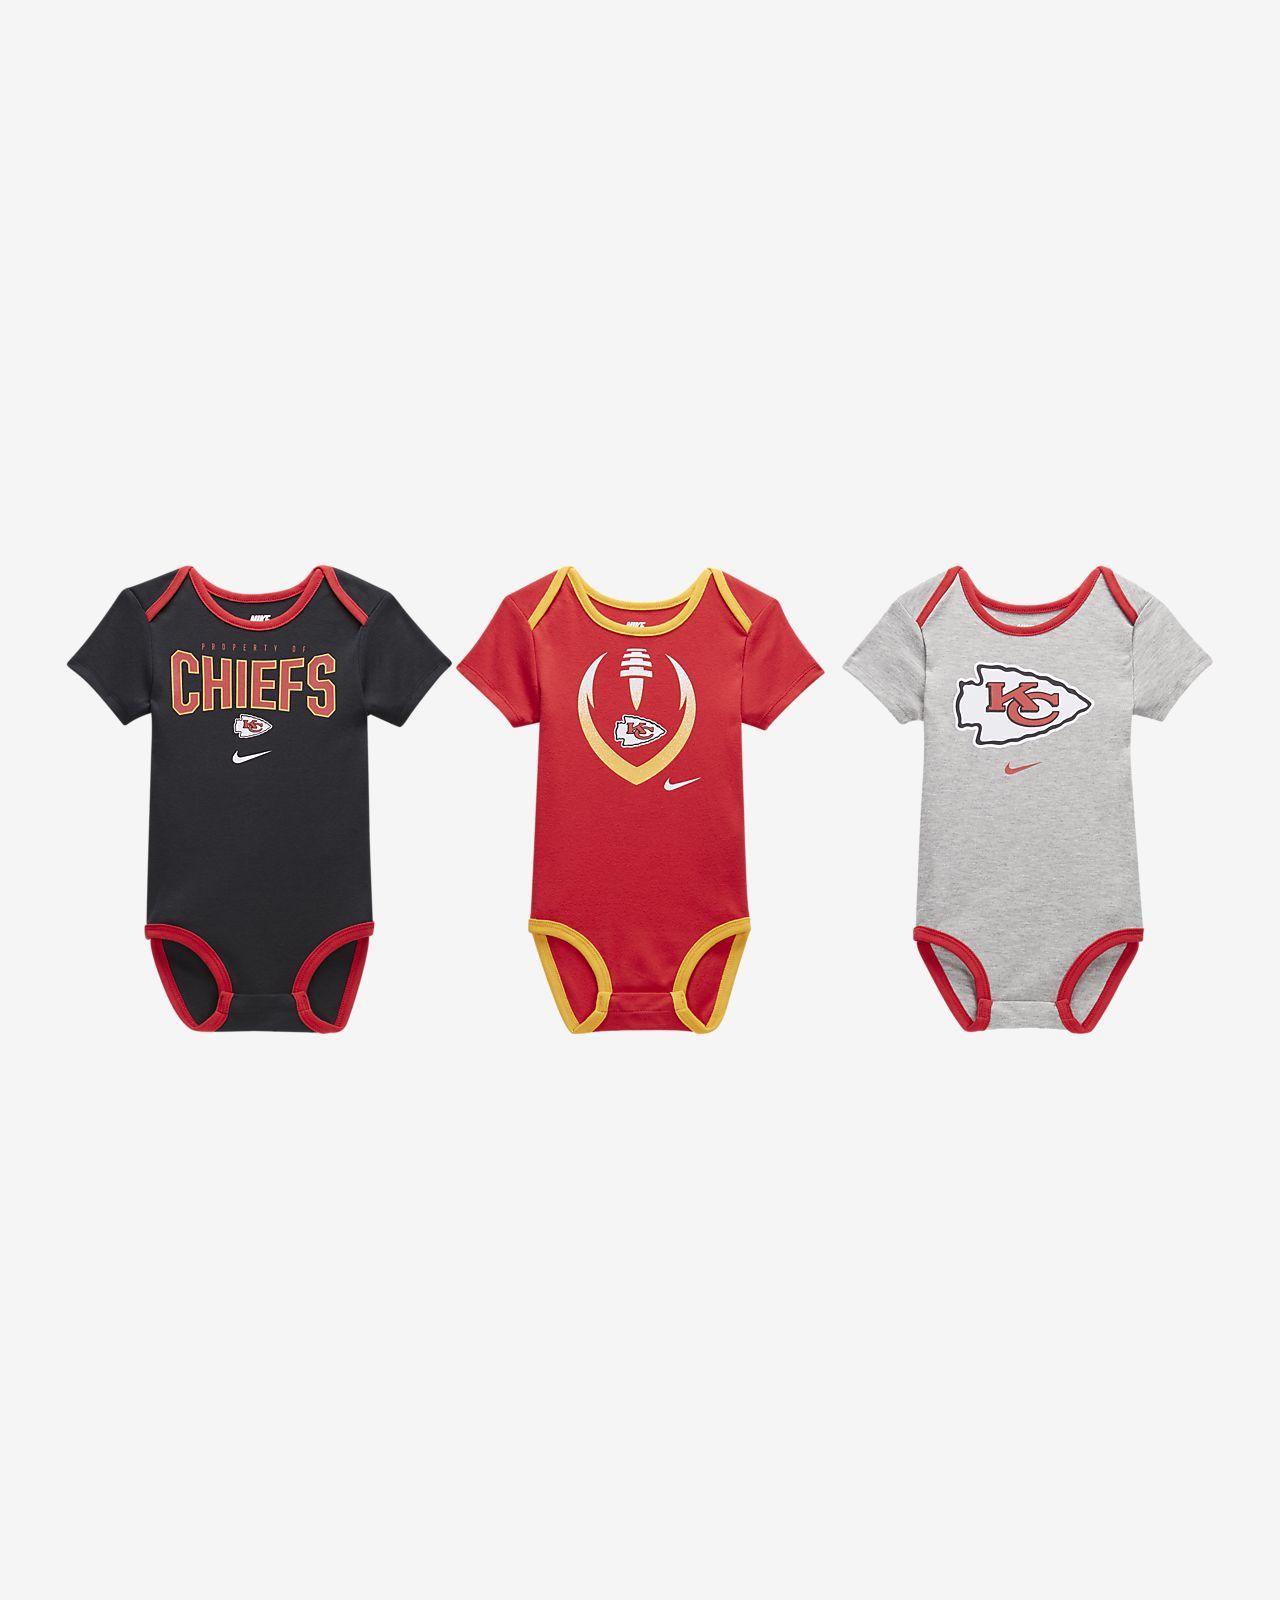 Nike (NFL Chiefs) Baby Bodysuit (3-Pack)